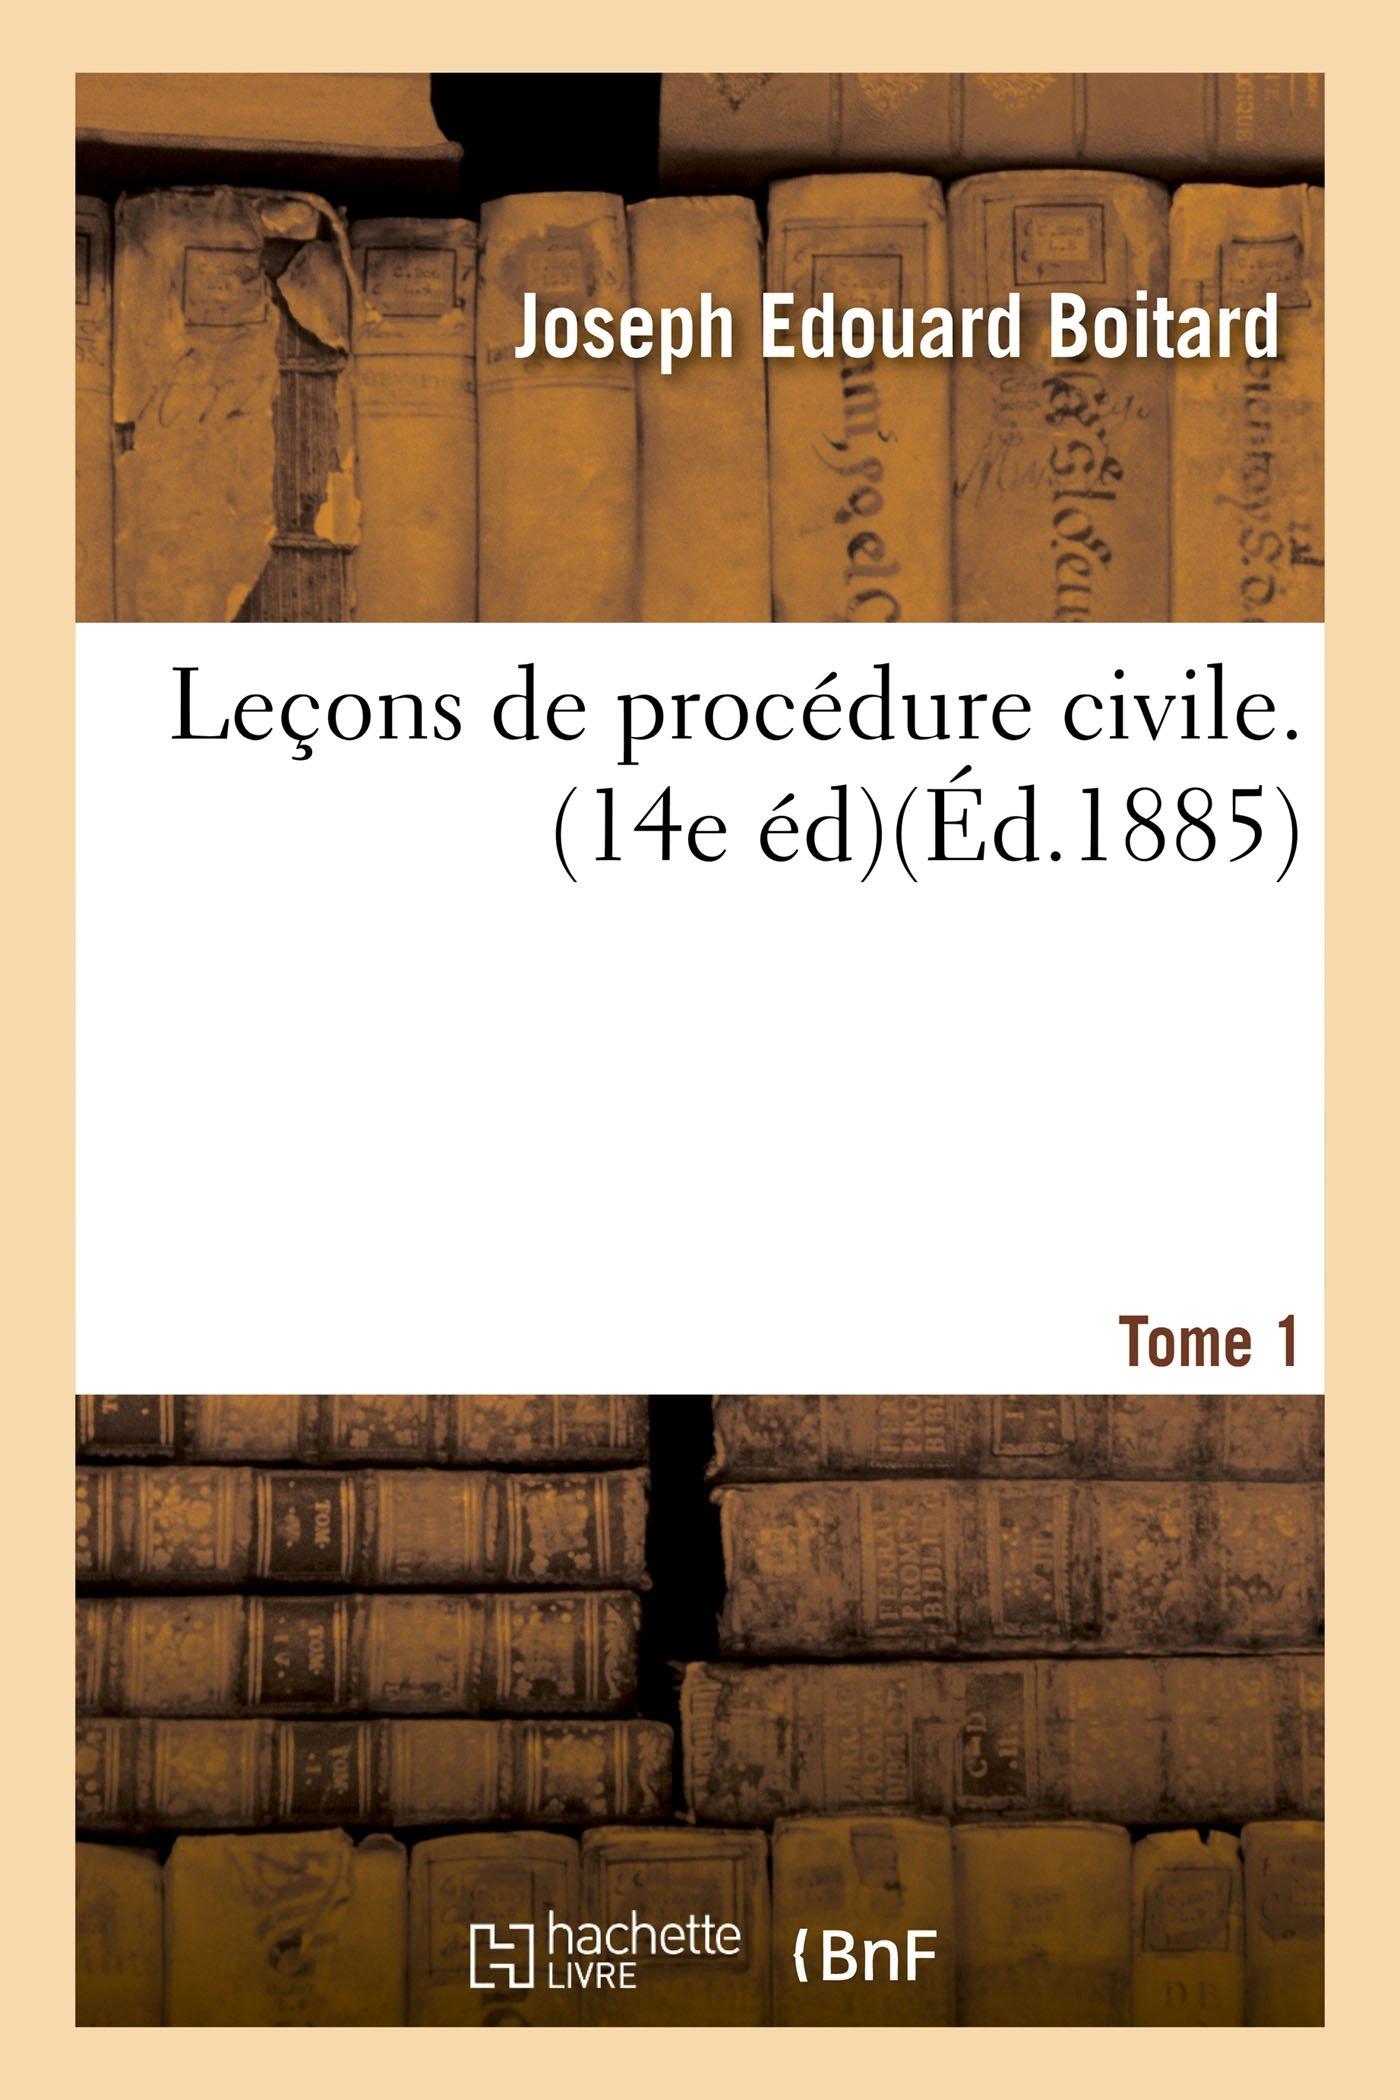 Download Leçons de Procédure Civile. Edition 14, Tome 1 (Sciences Sociales) (French Edition) ebook